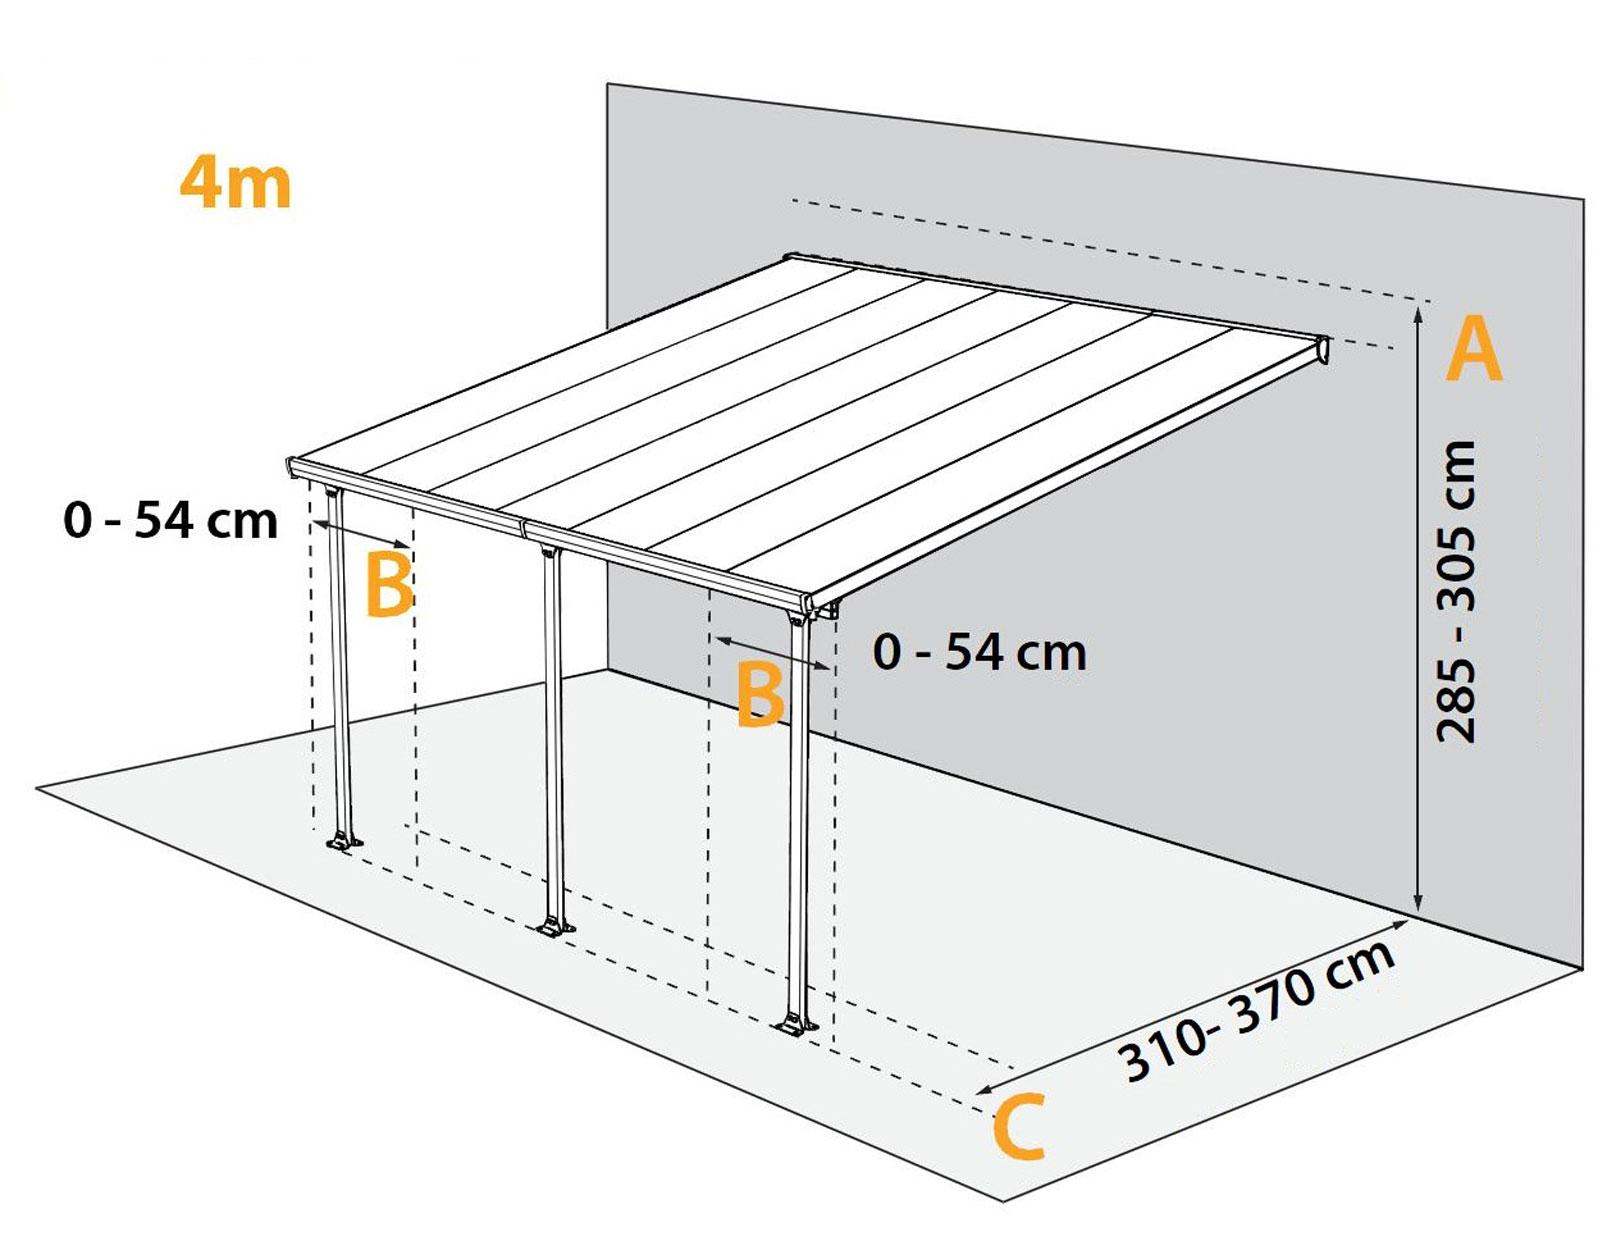 terrassen berdachung alu selber bauen terrassen aus holz selber bauen alle ideen ber home. Black Bedroom Furniture Sets. Home Design Ideas